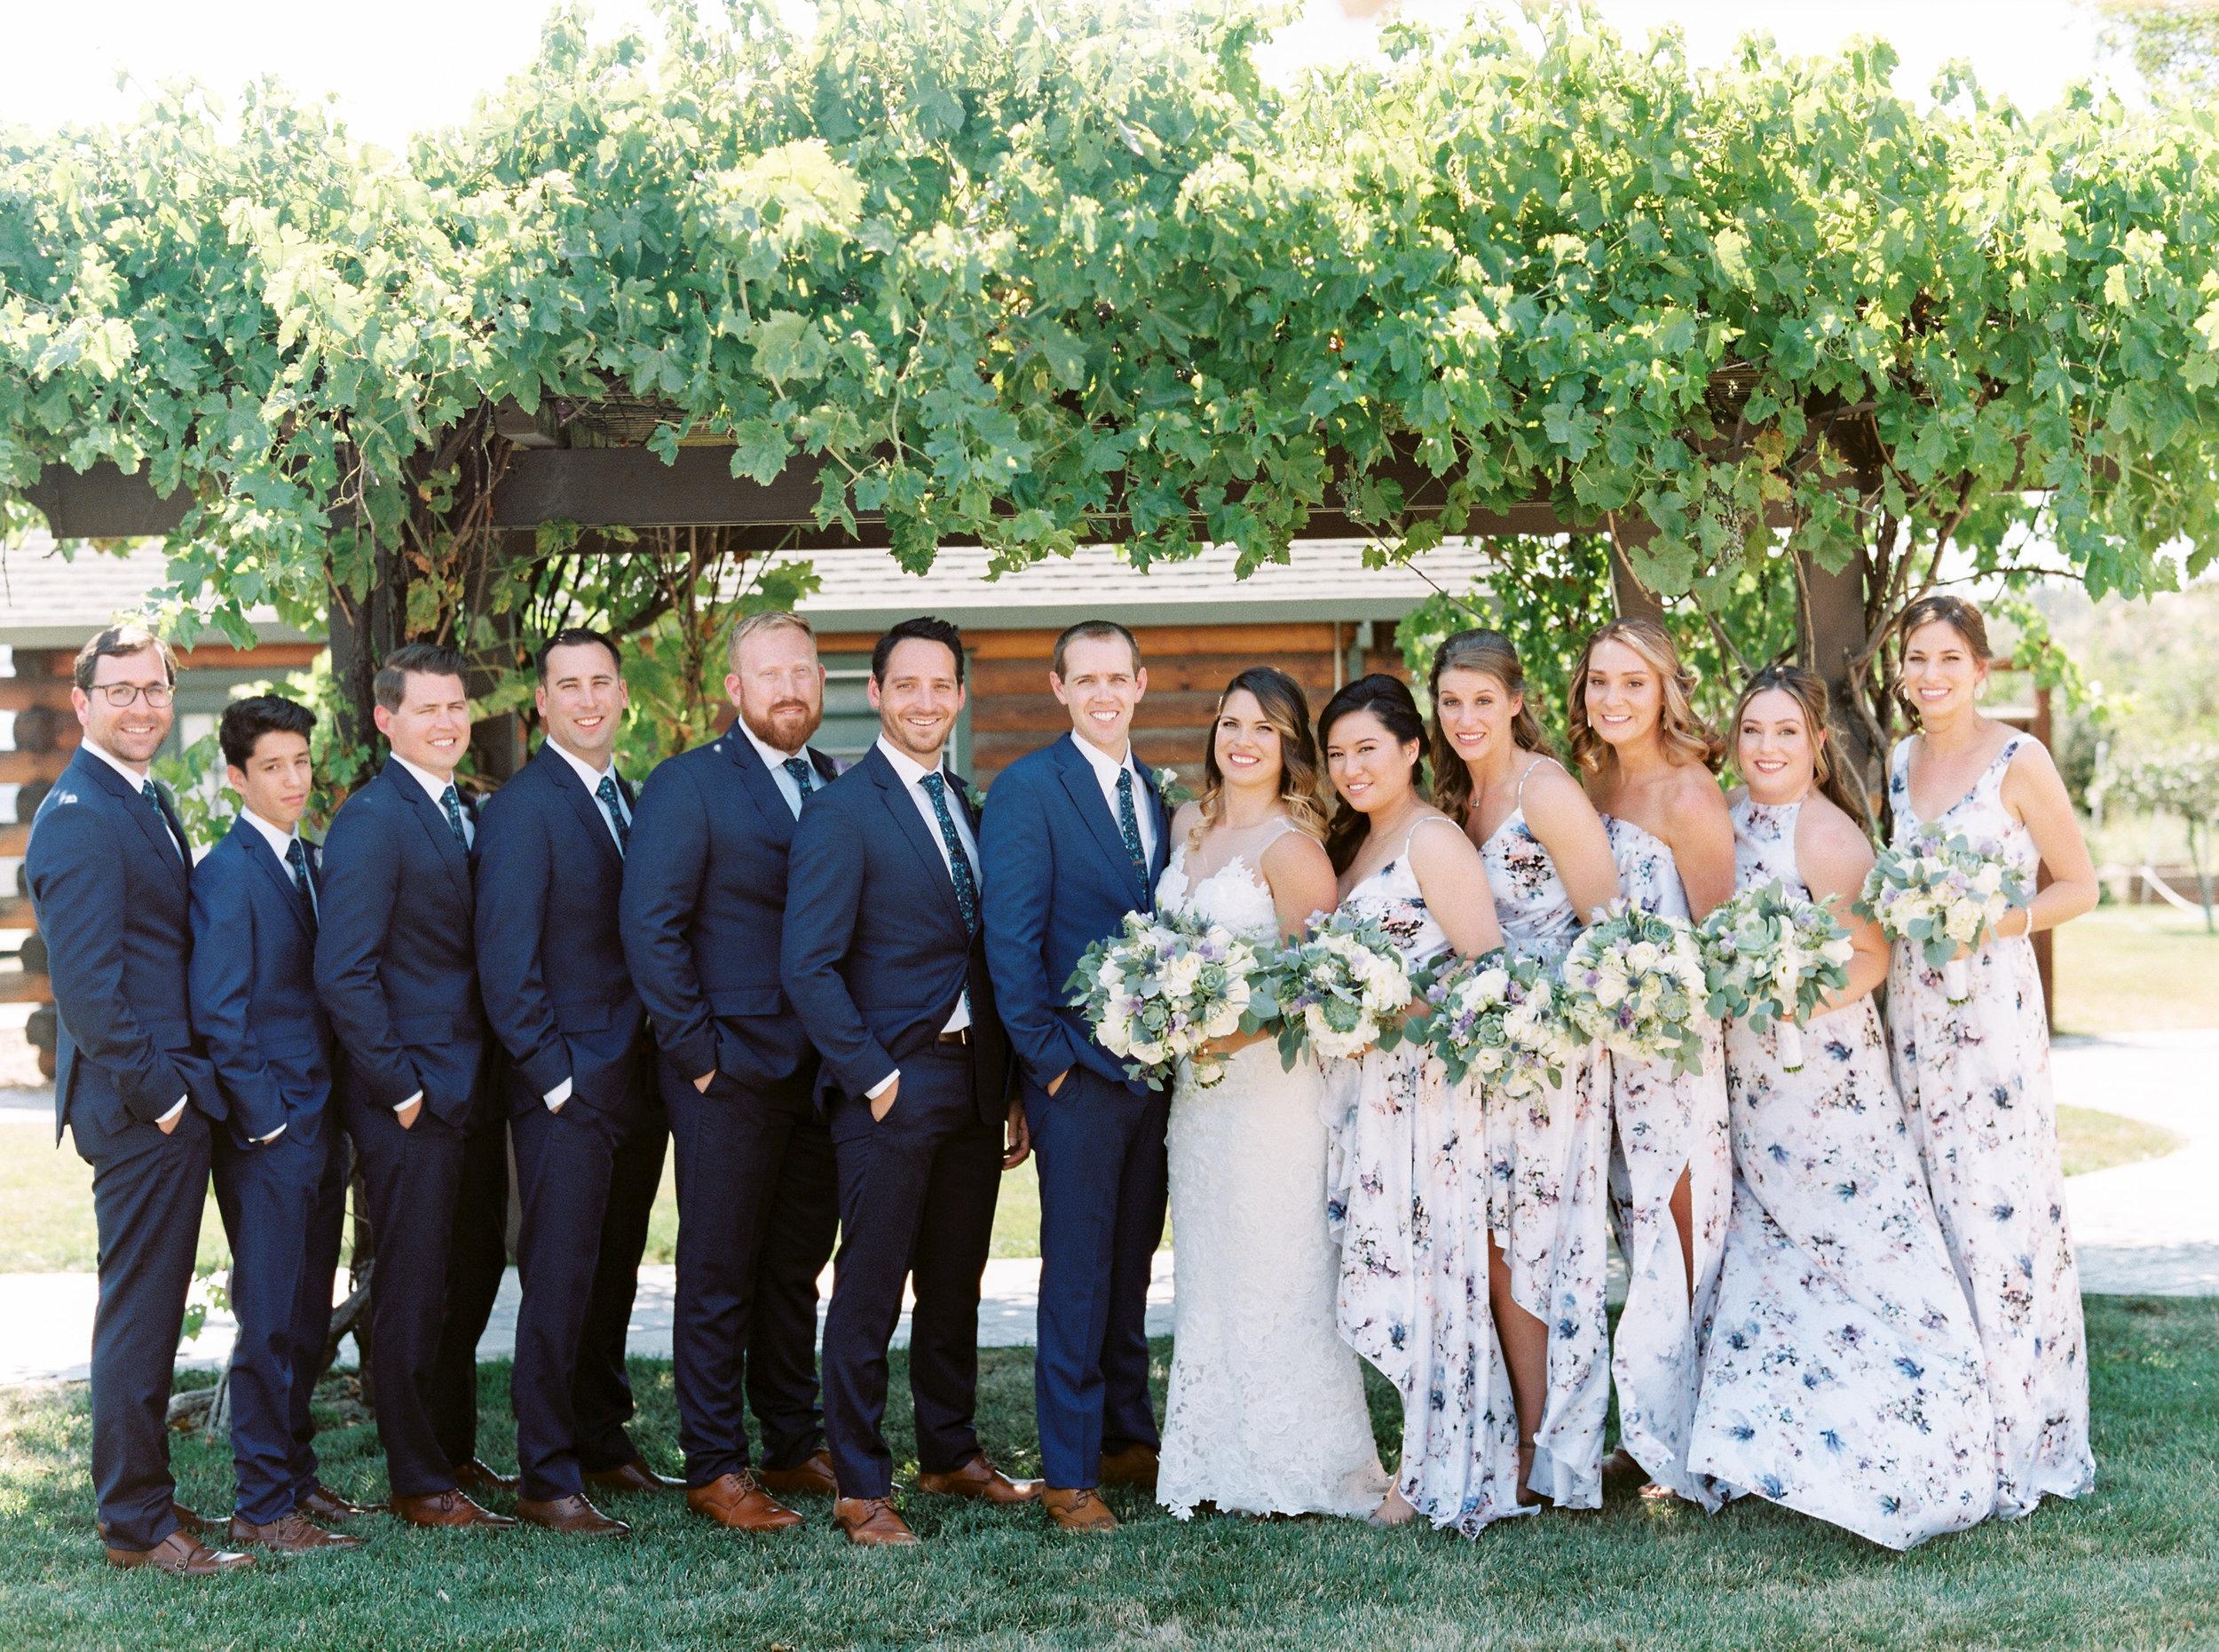 the-purple-orchid-resort-wedding-in-livermore-california-211.jpg